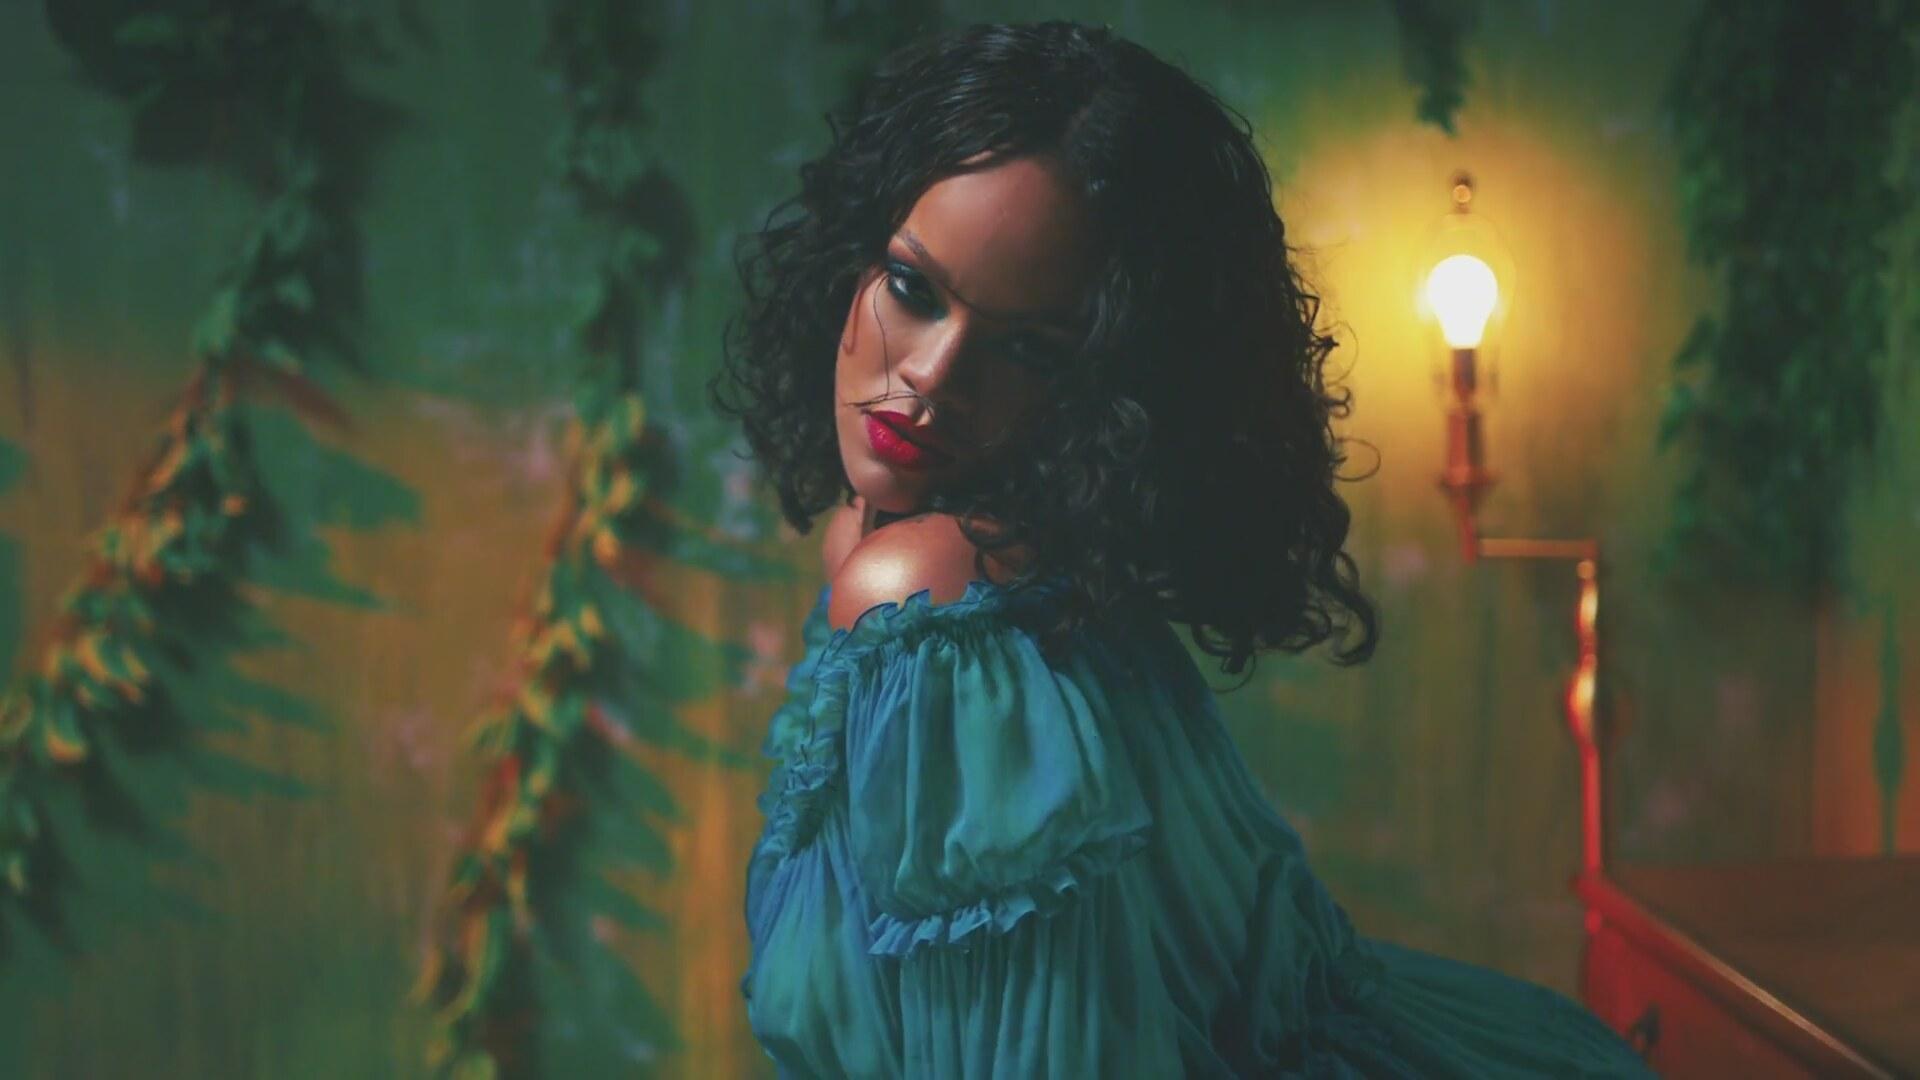 Watch DJ Khaleds Wild Thoughts Video Featuring Rihanna And